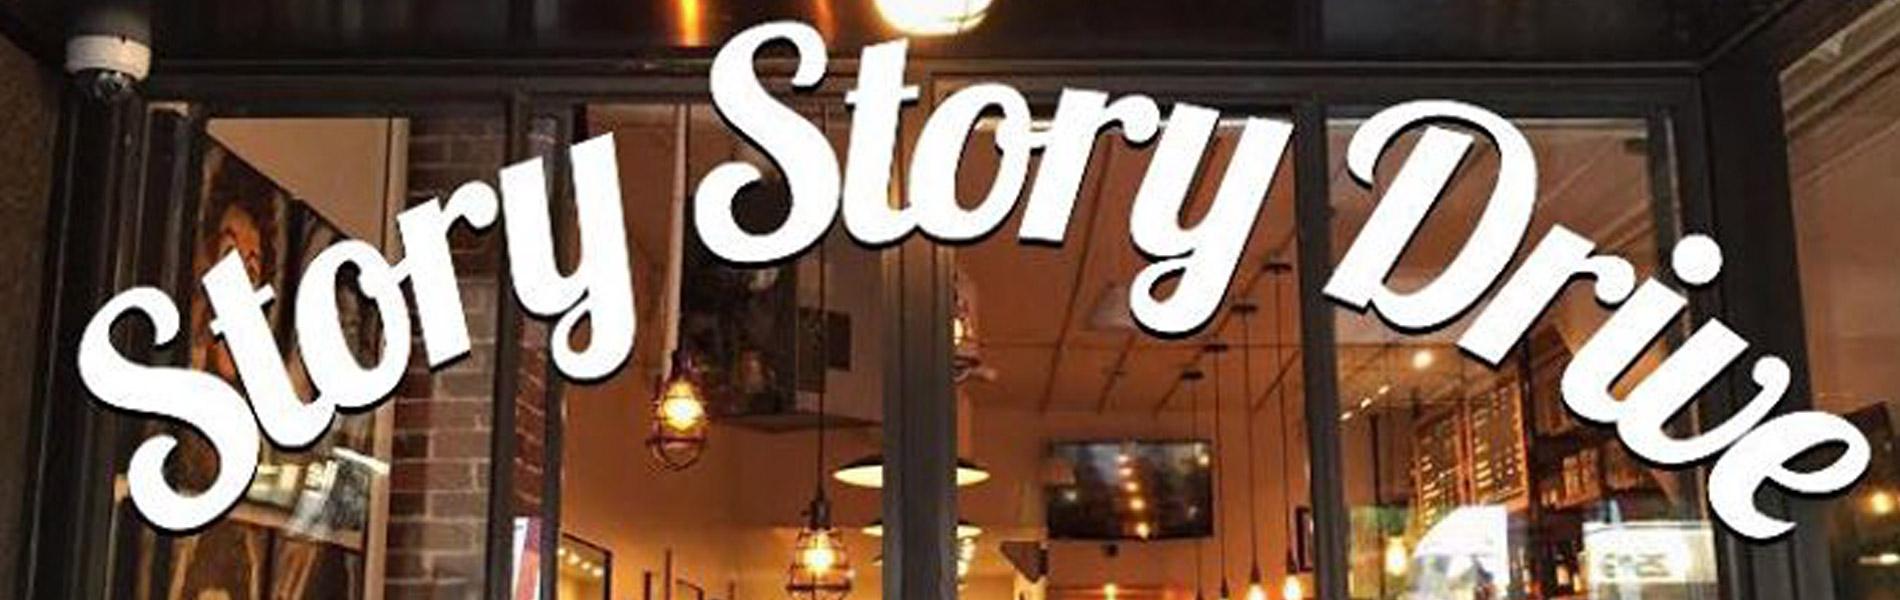 Story Story Drive